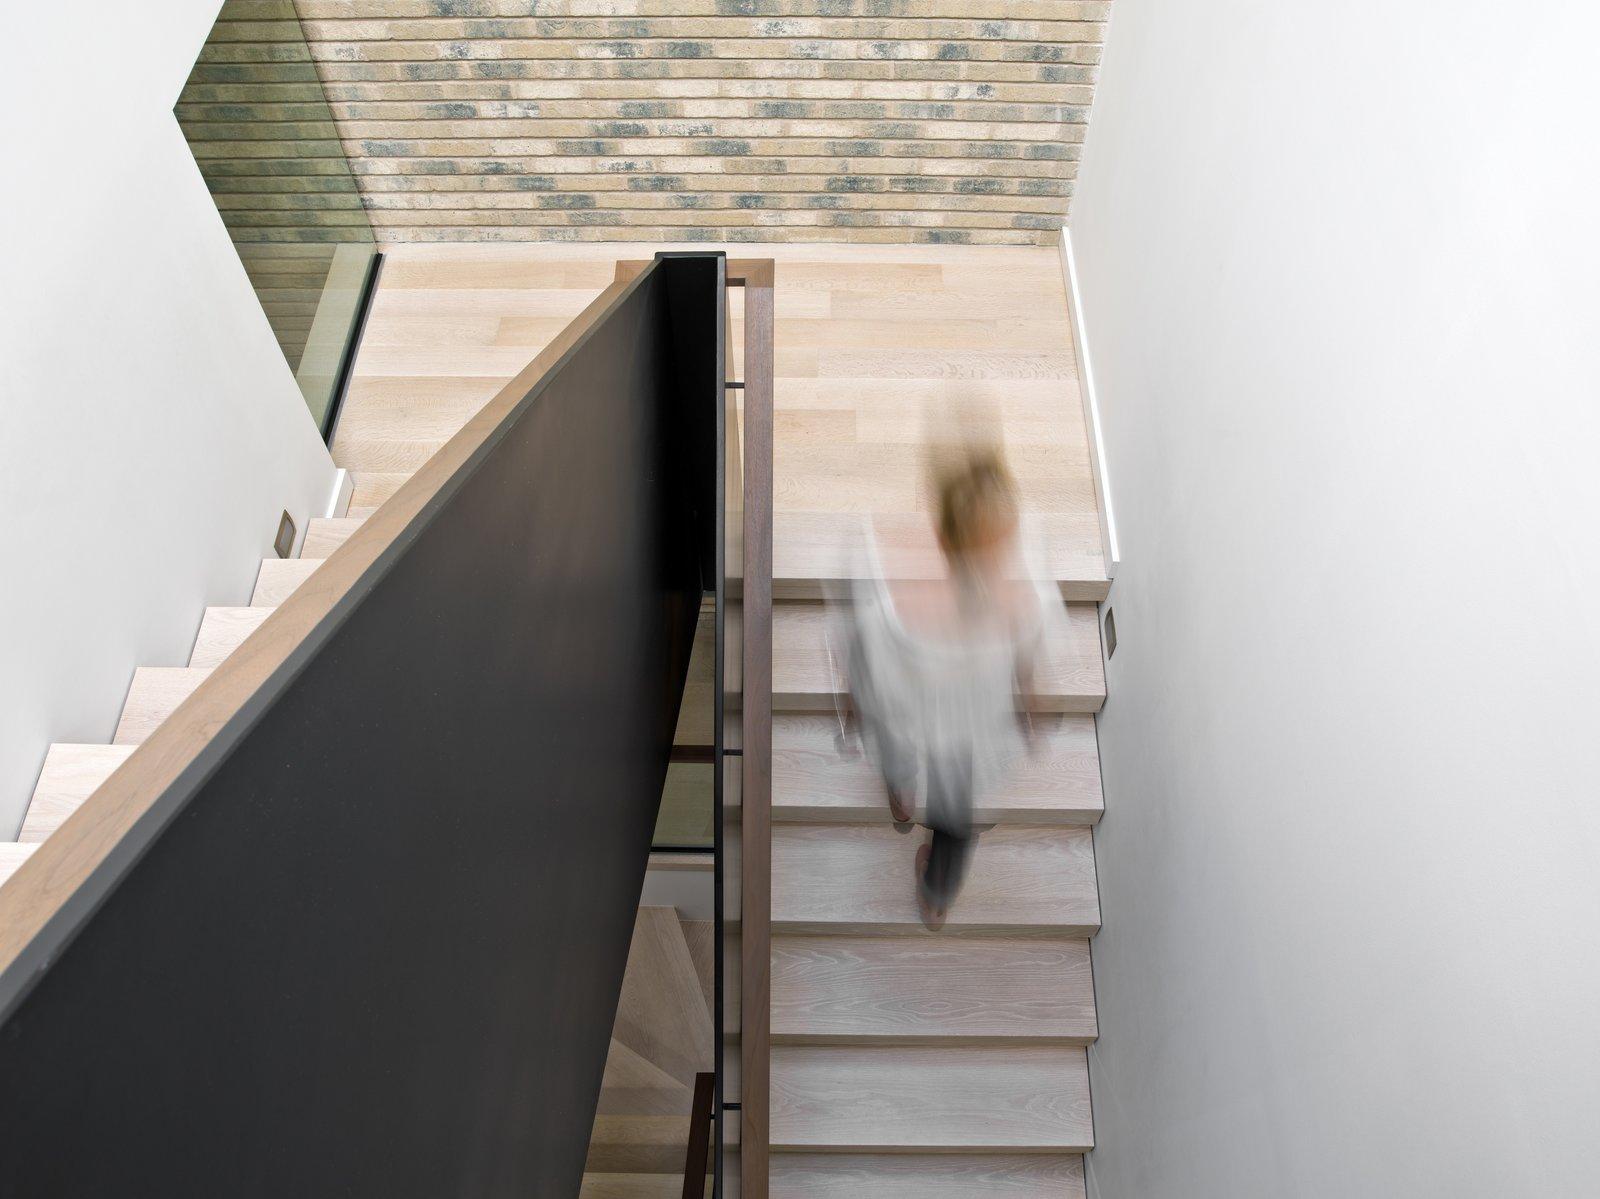 Staircase, Wood Tread, Wood Railing, and Metal Railing  Eastwood Residence by Searl Lamaster Howe